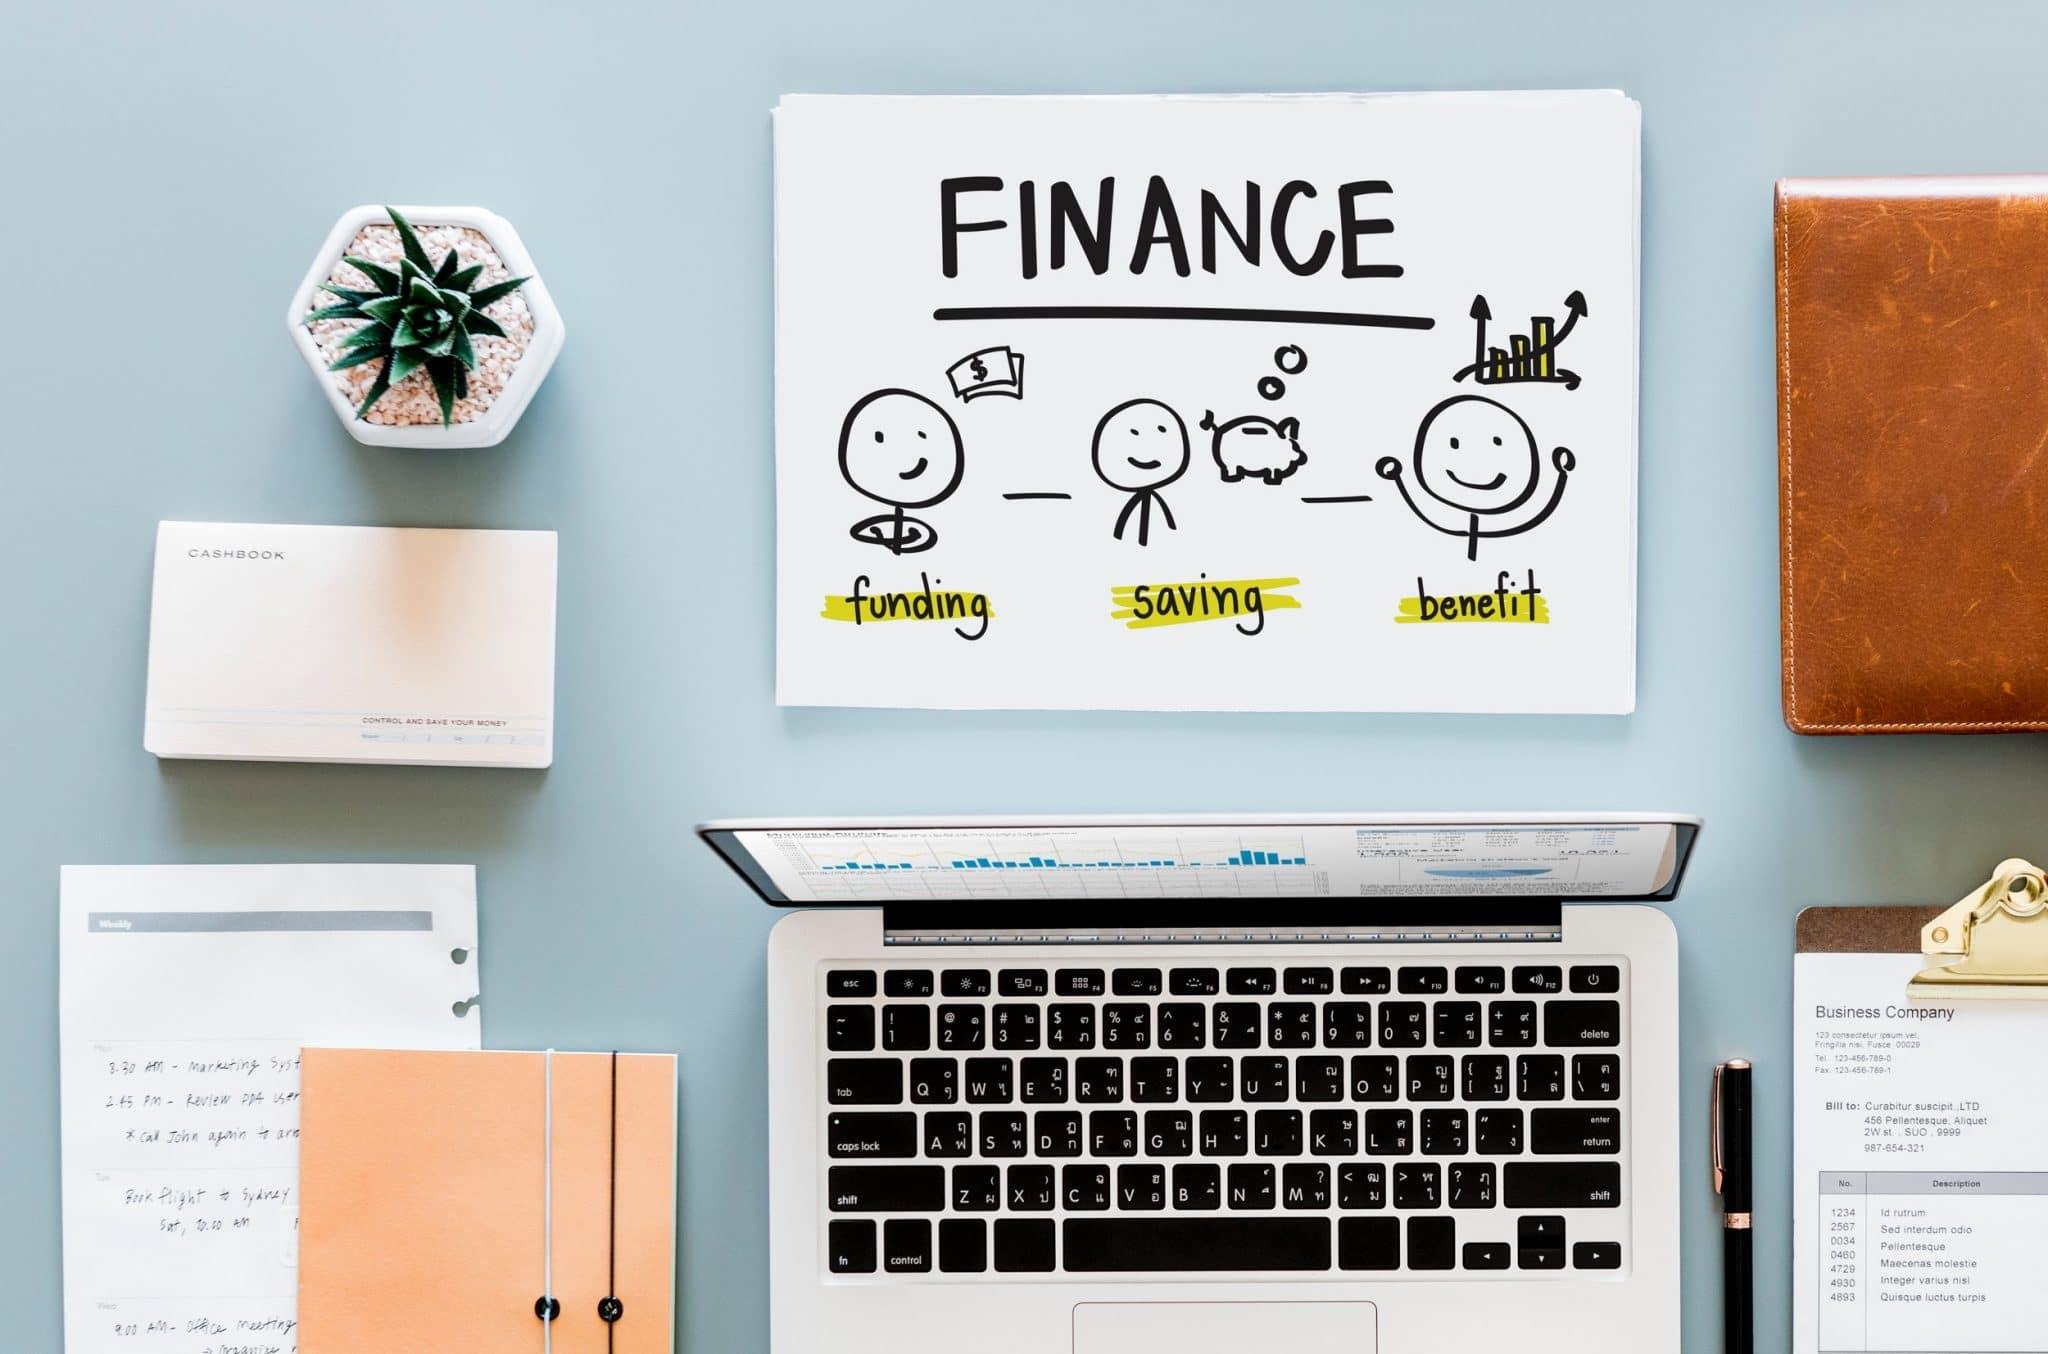 SAP Finance and Controlling (SAP FICO) SAP S/4HANA Finance, Finance